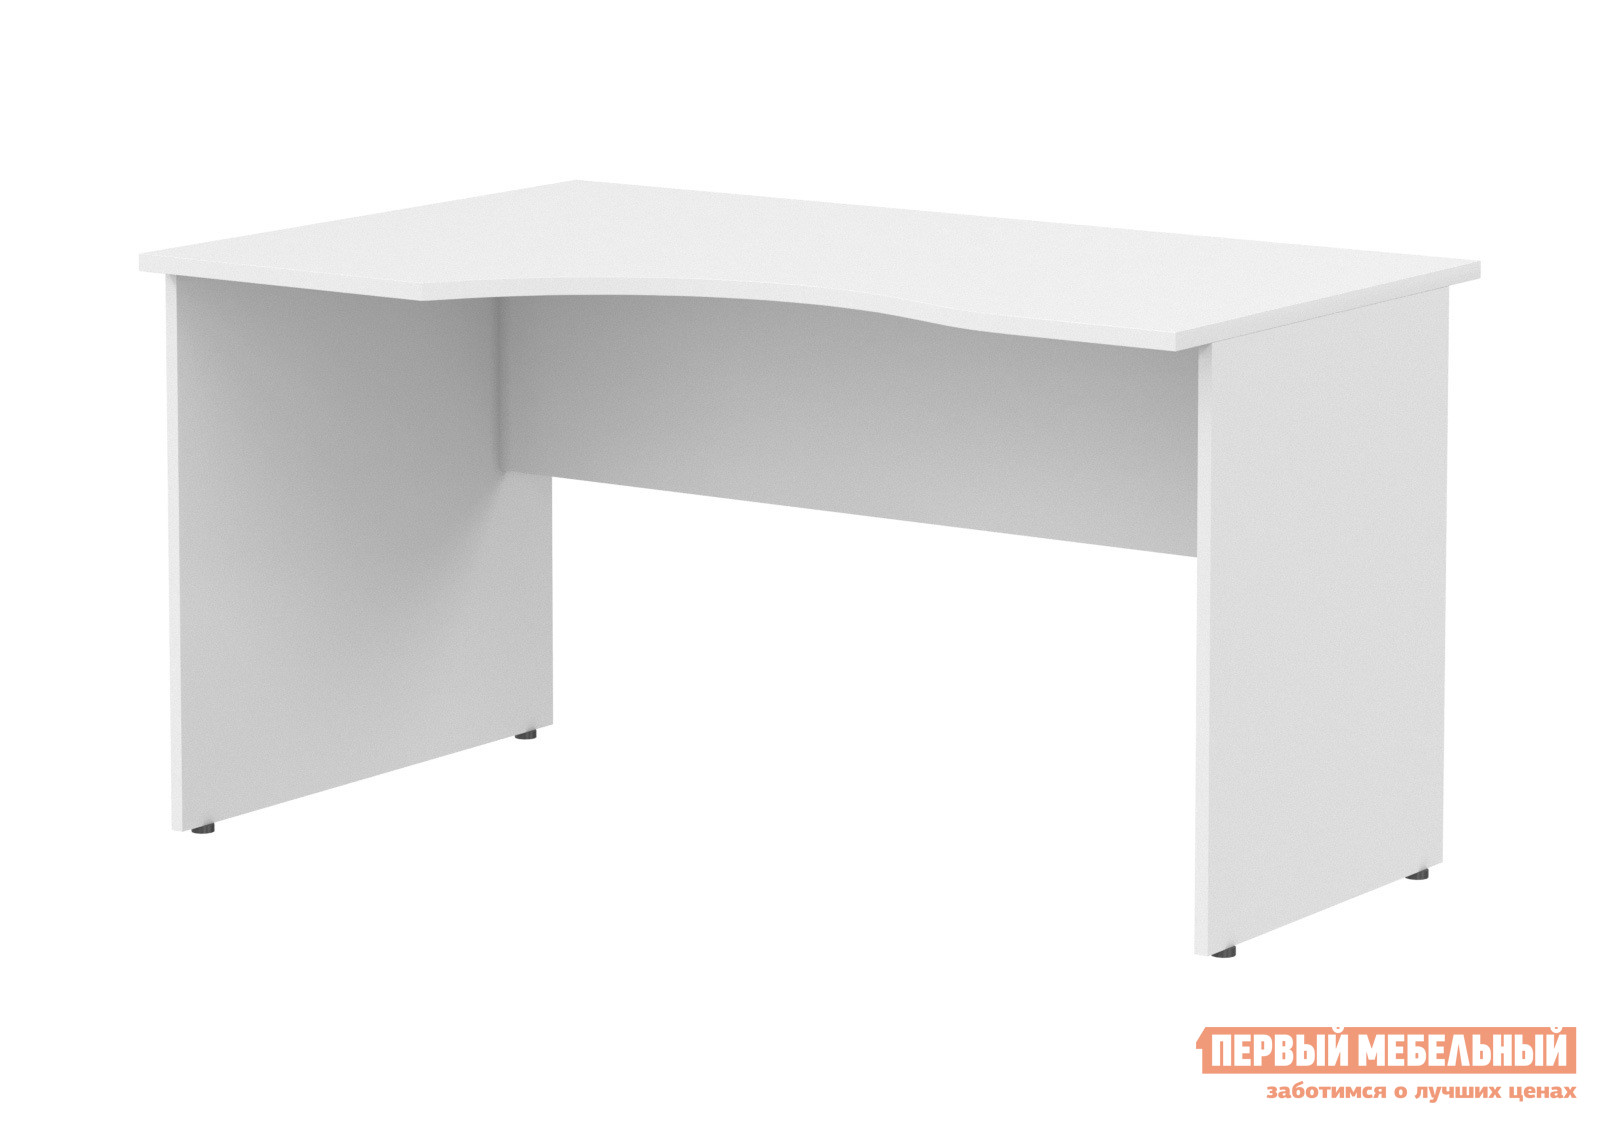 Письменный стол Тайпит СА-2 левый письменный стол тайпит ost 127